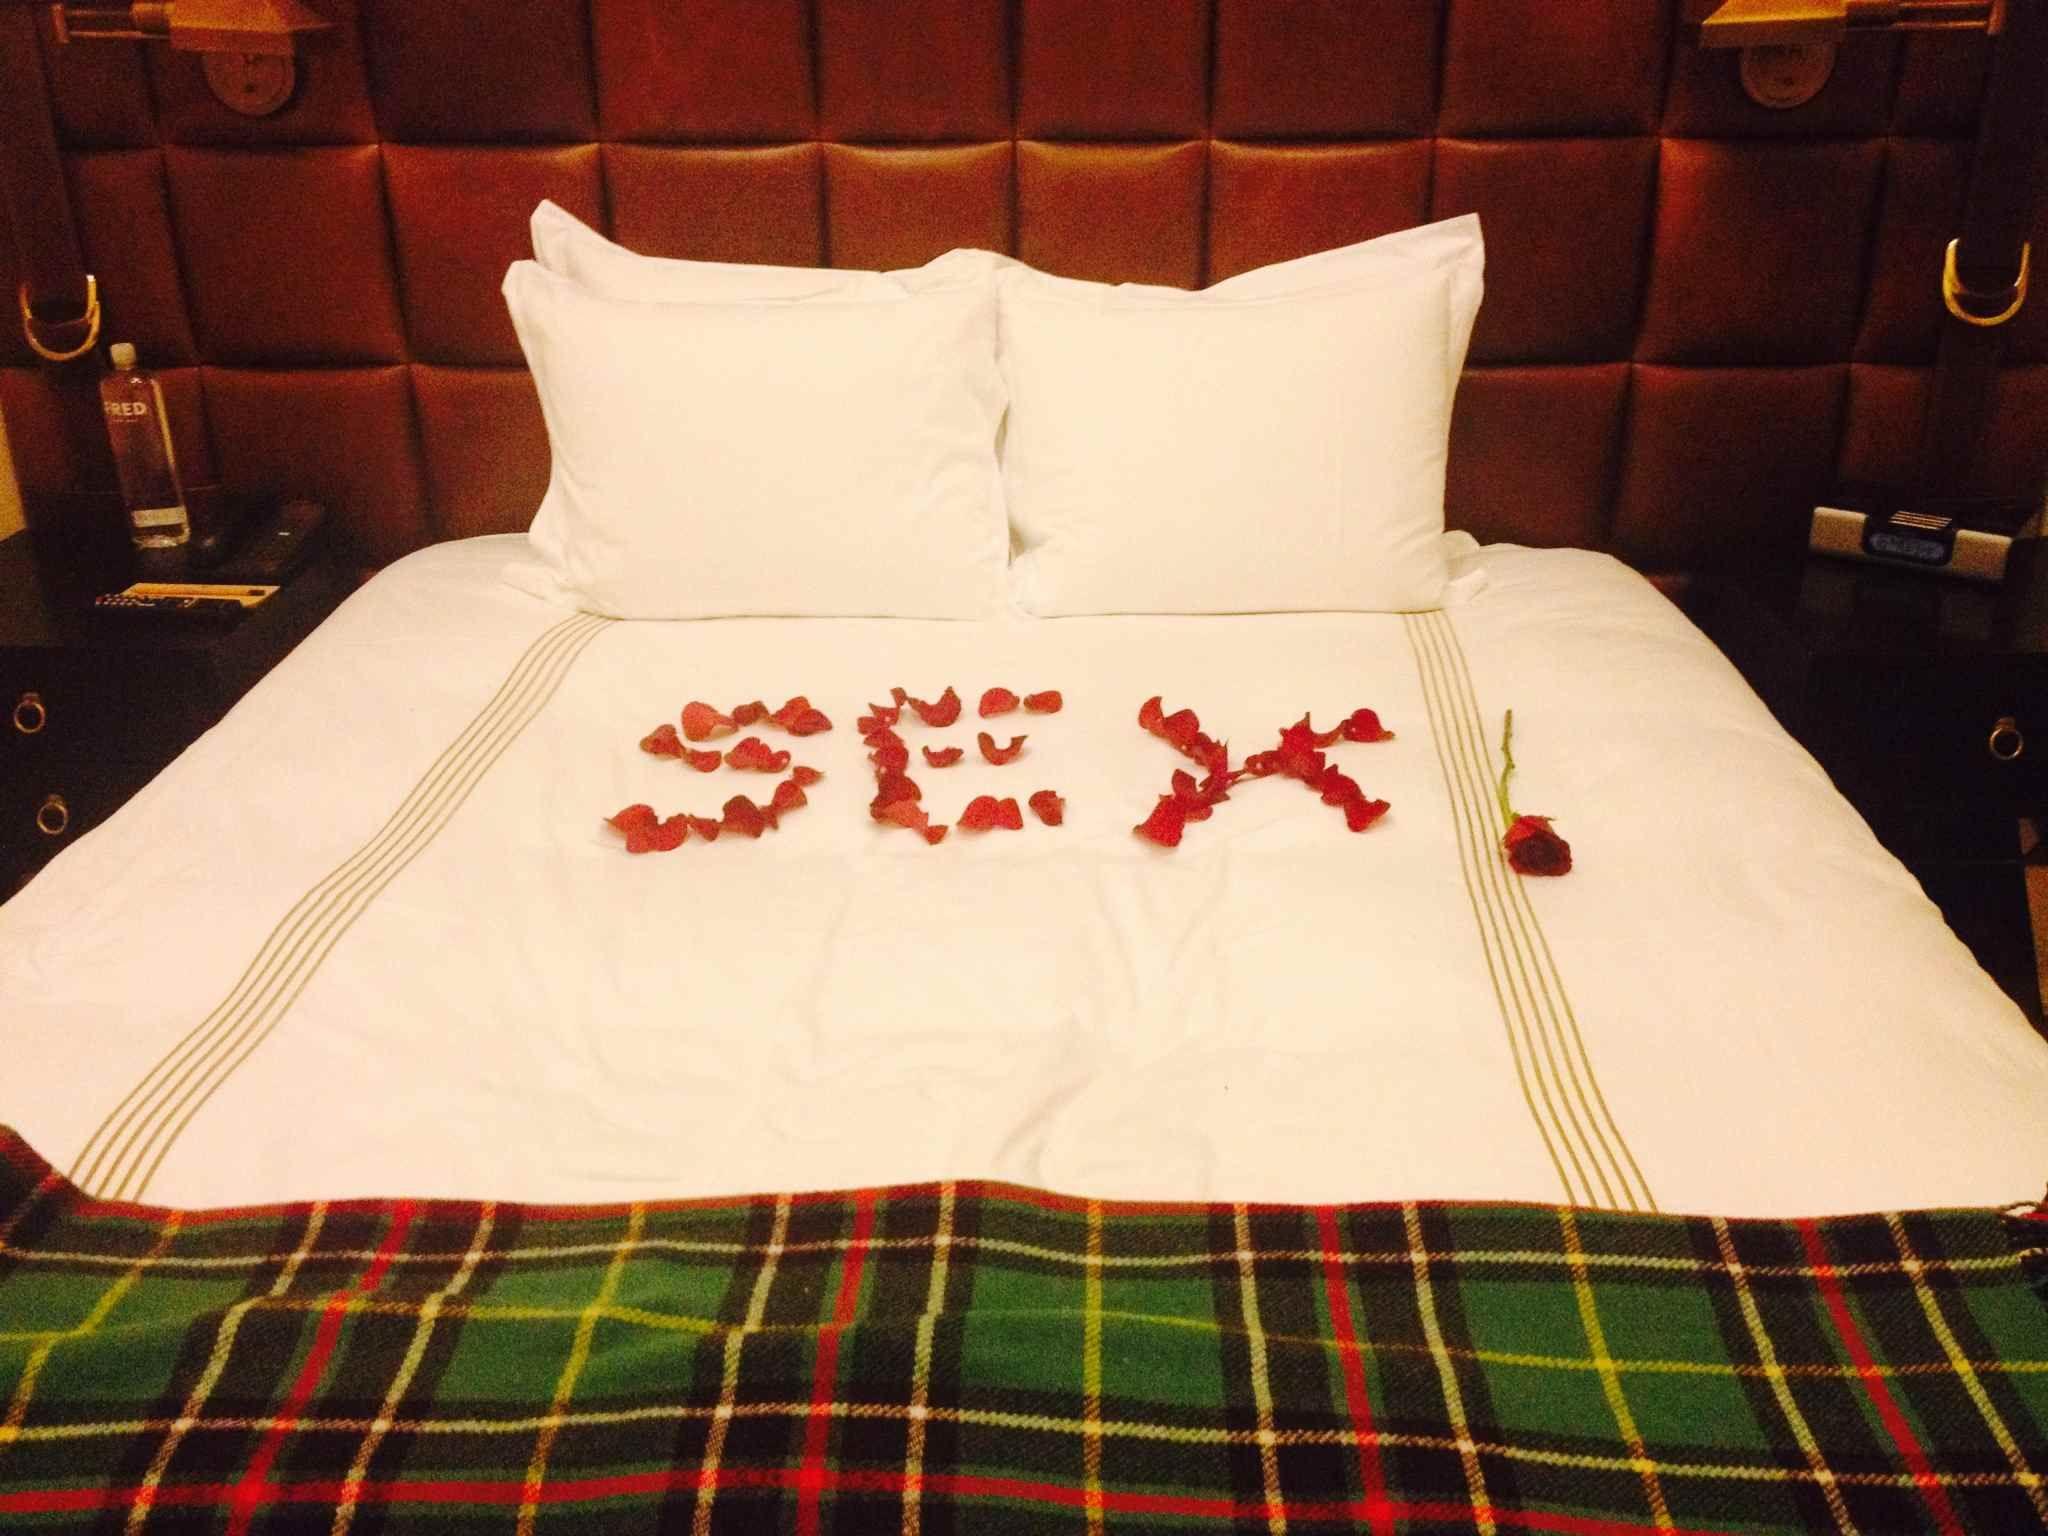 Romantic bedroom rose petals - Silly Wedding Ideas Honeymoon Groom Bride Rose Flower Petals Messages Reception Rehearsal Dinner Send Off Prank Joke Bridal Party Engagement